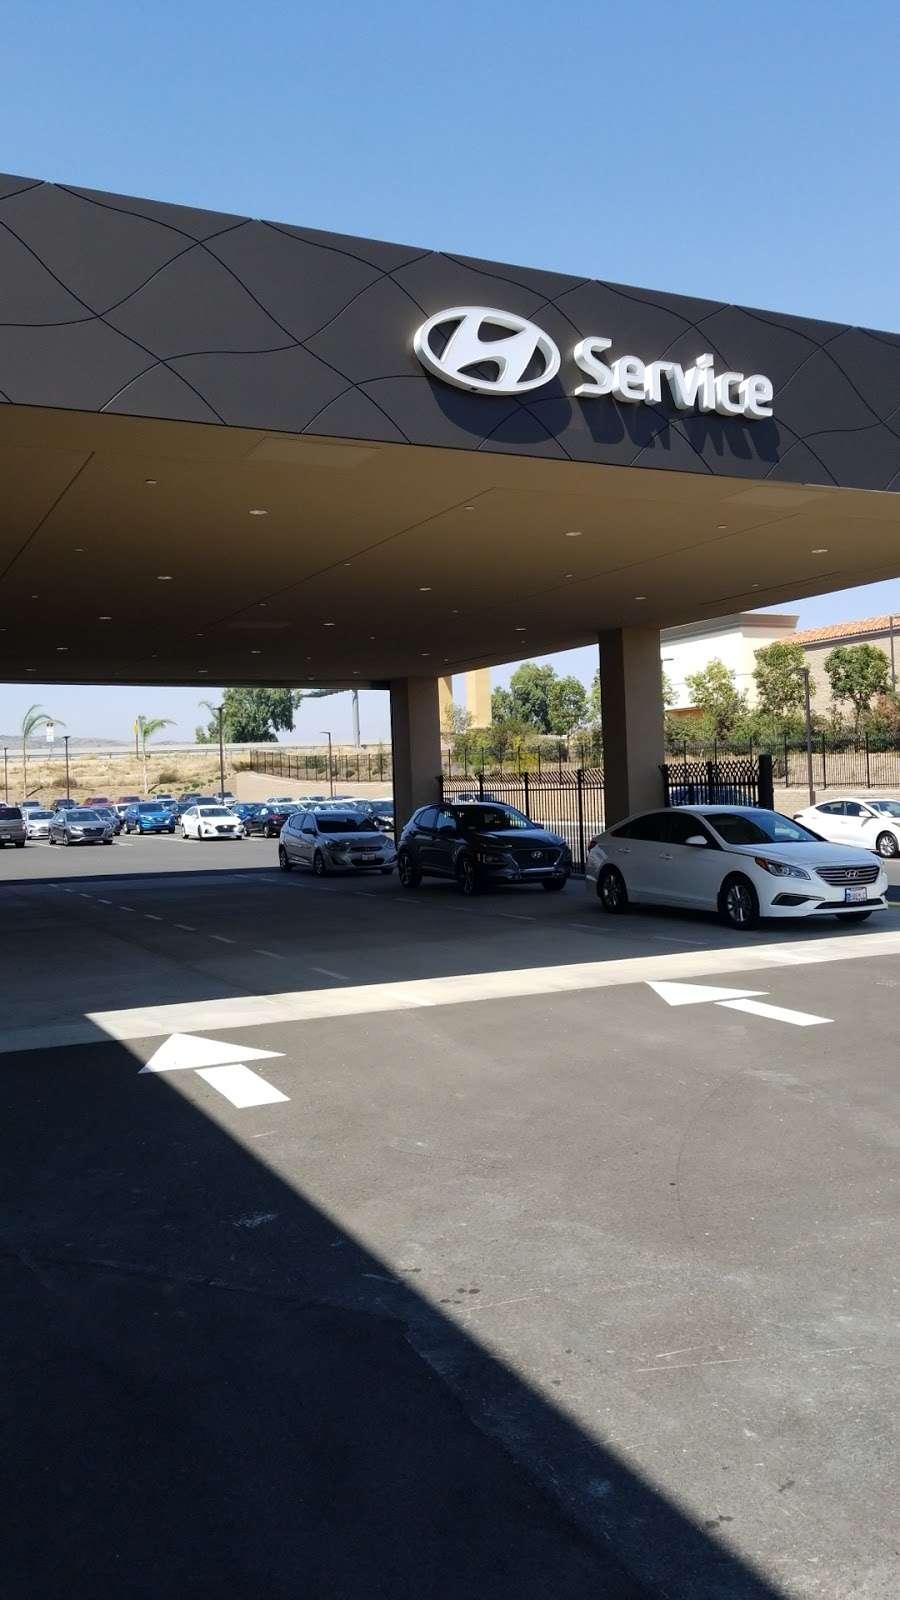 Hyundai Of Moreno Valley - car dealer  | Photo 4 of 10 | Address: 27500 Eucalyptus Ave, Moreno Valley, CA 92555, USA | Phone: (951) 383-3071